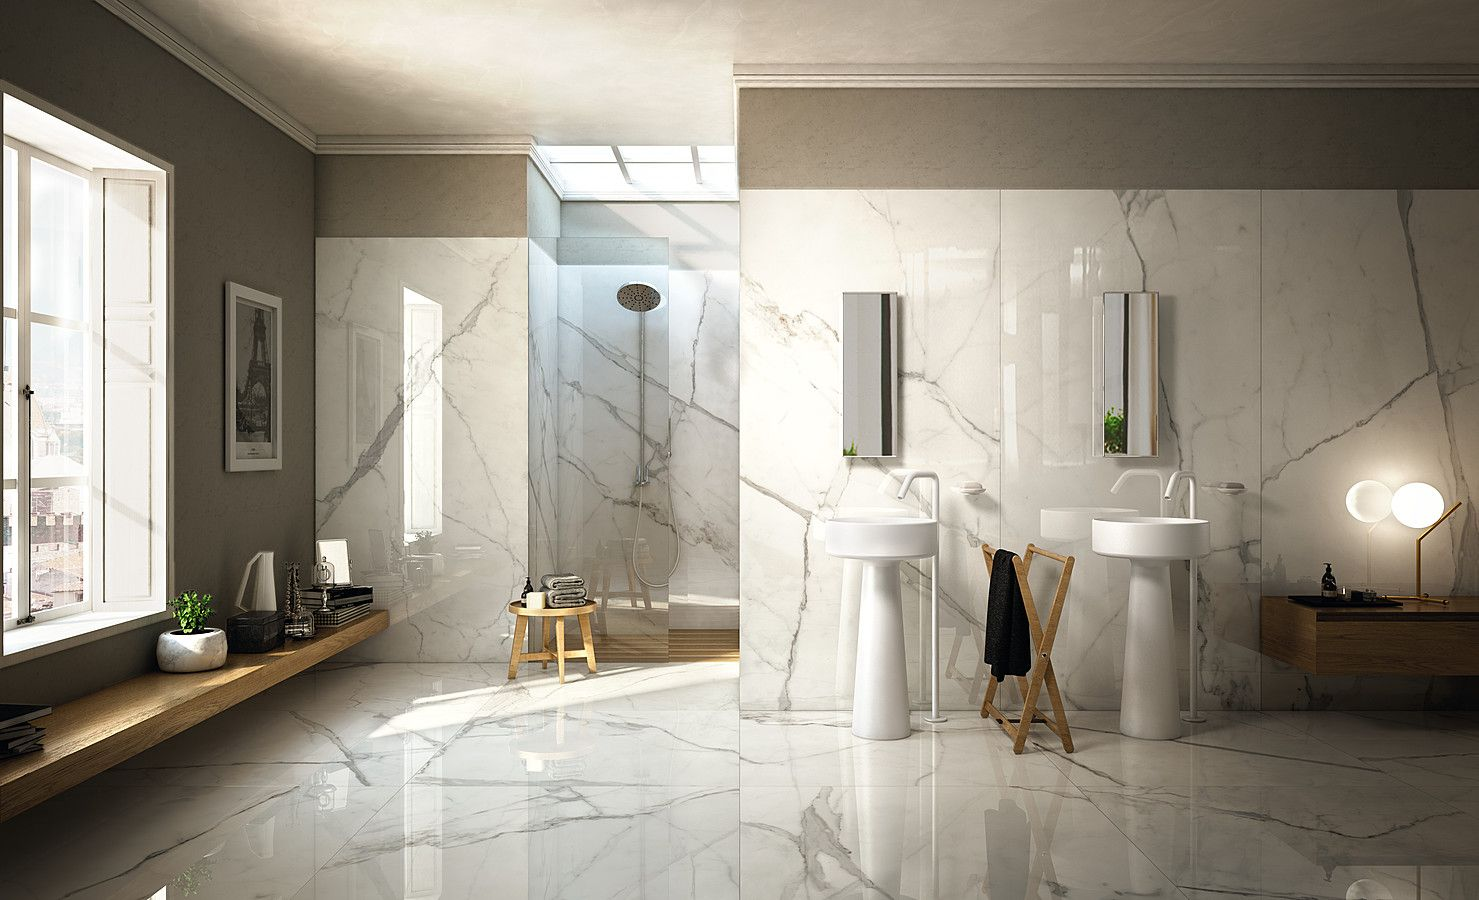 Marmol, madera, ALCACHOFA DUCHA | Дизайн ванной, Дом, Квартира студия